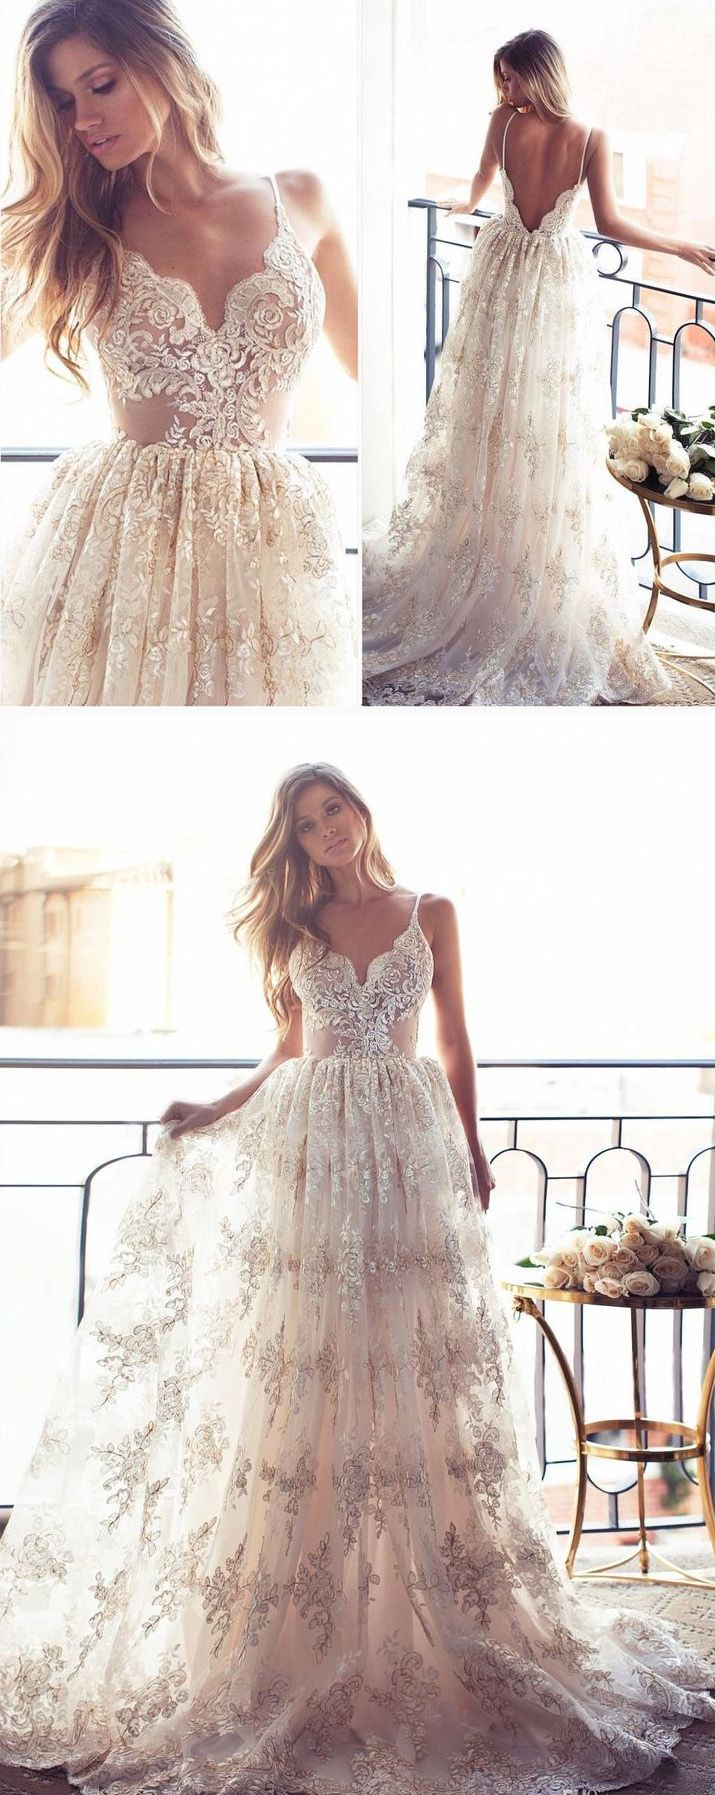 Customized alineprincess evening prom dresses long champagne